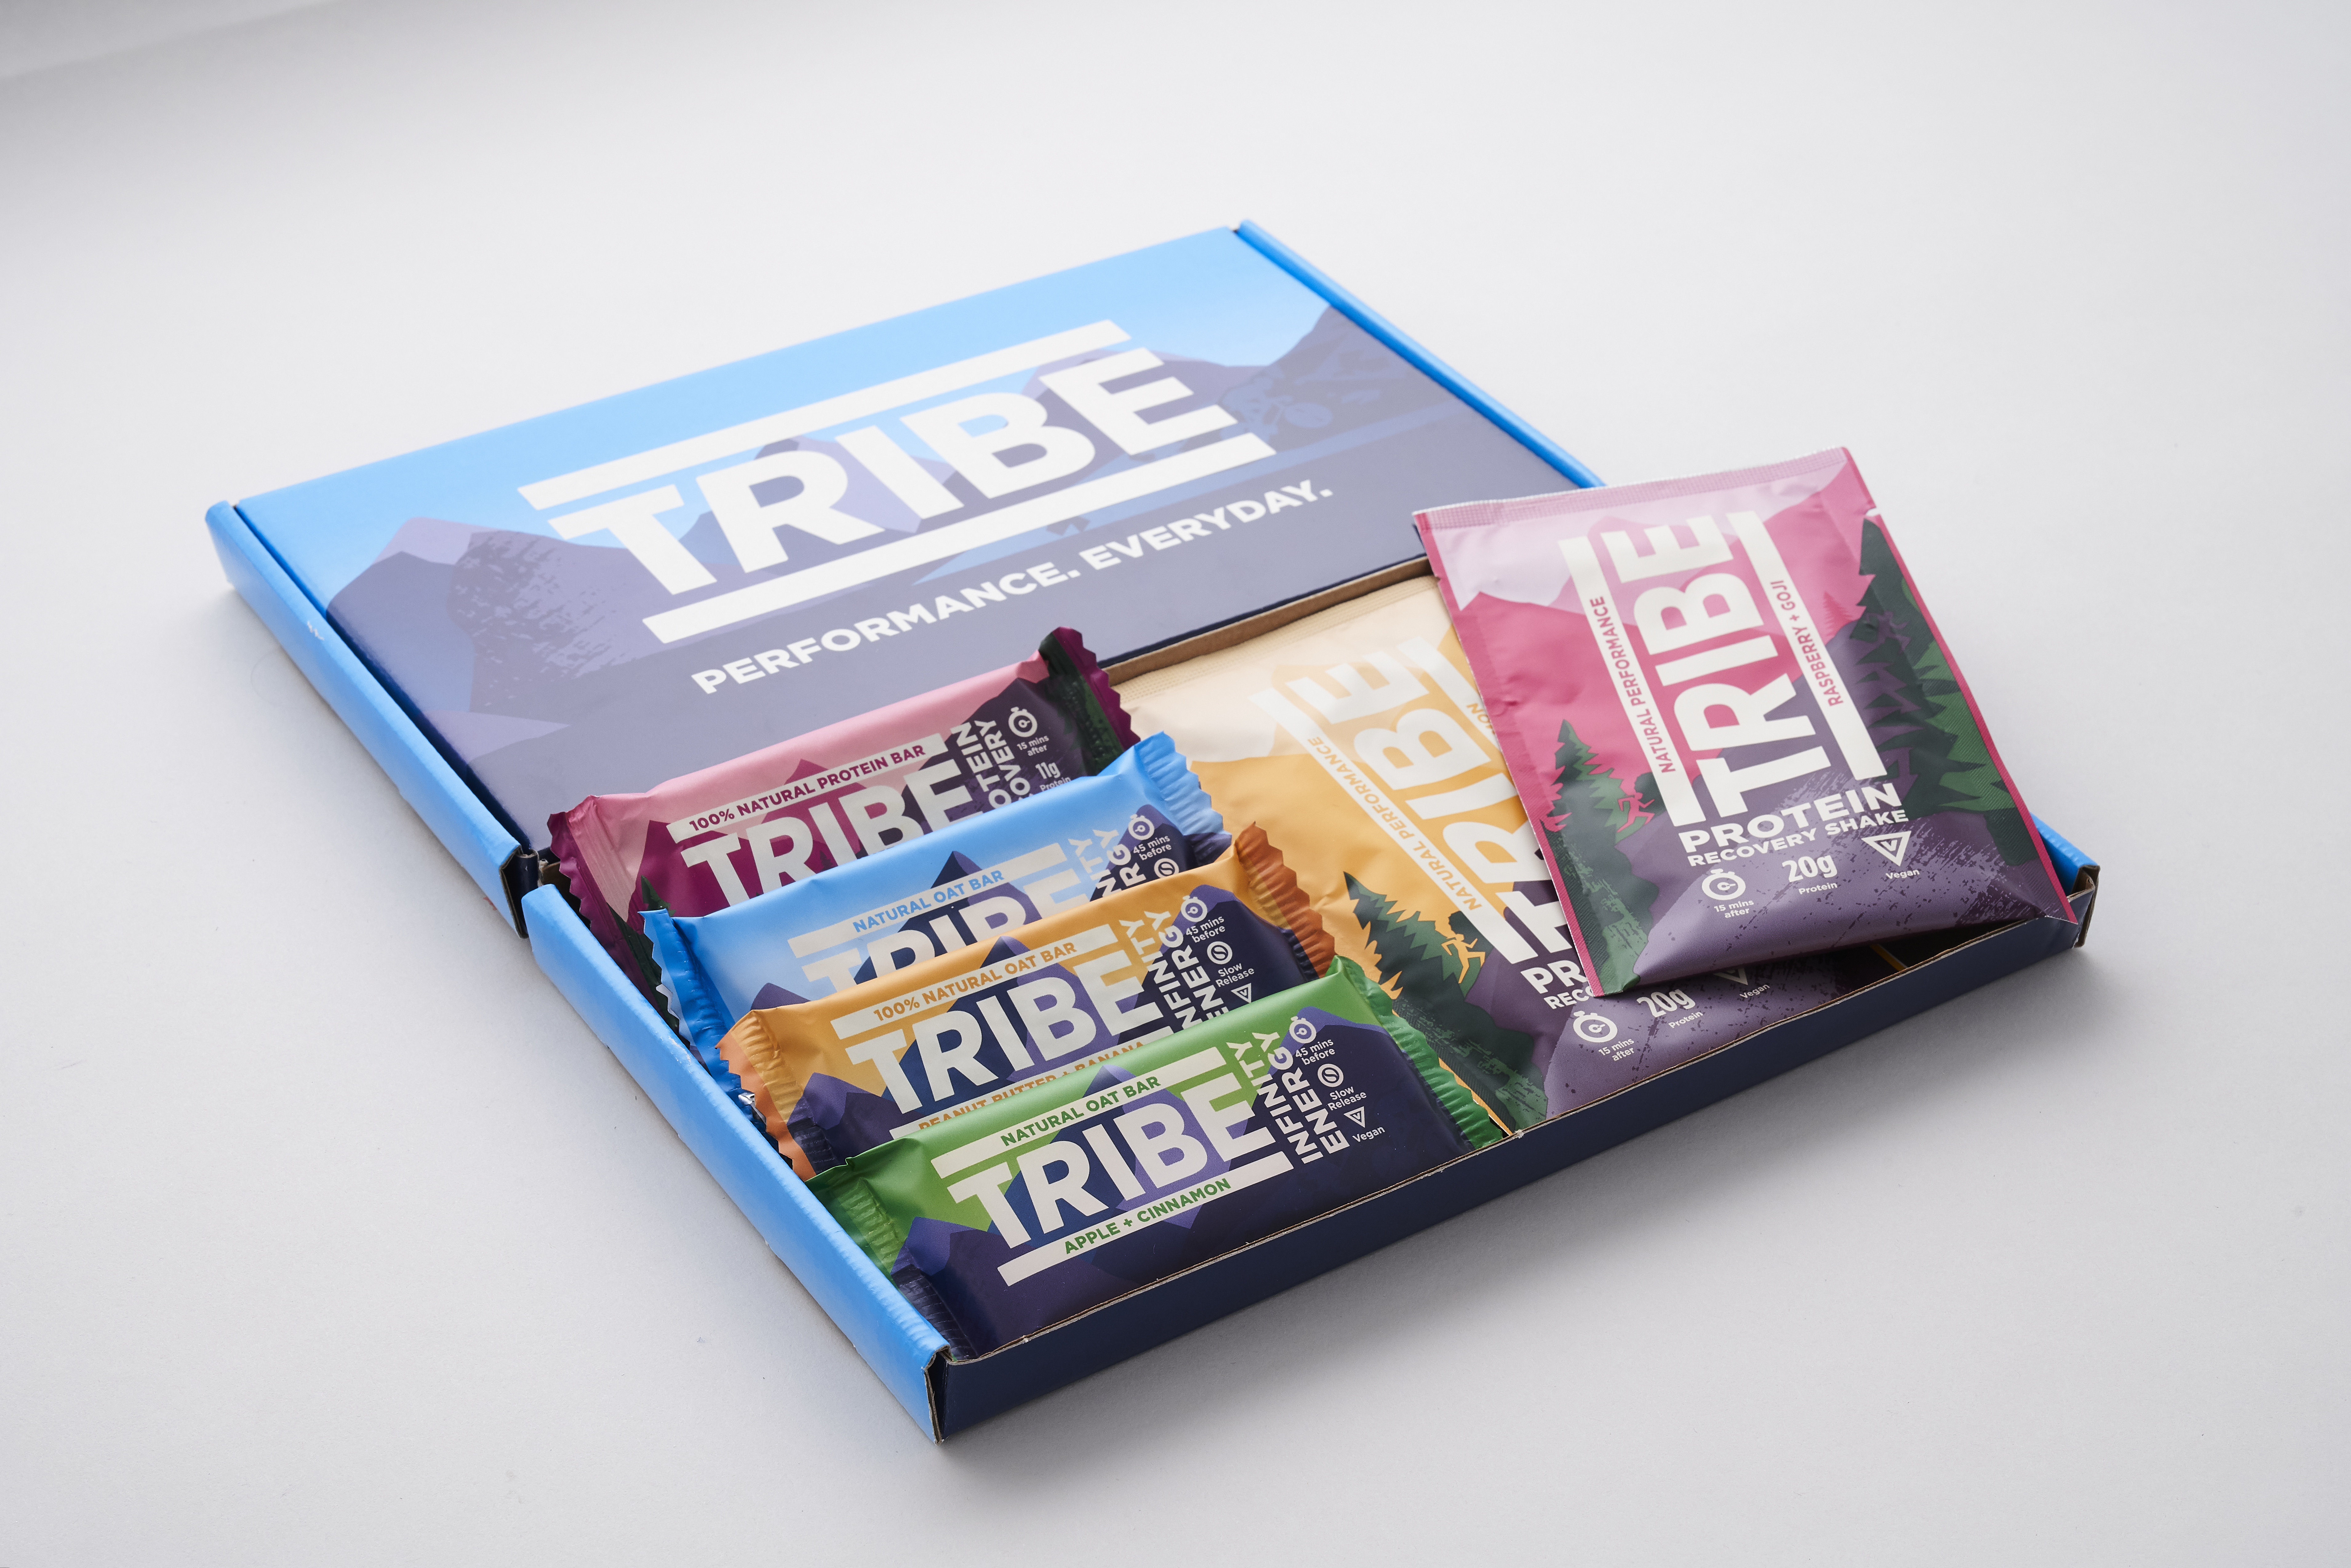 TRIBE-5.9.180079